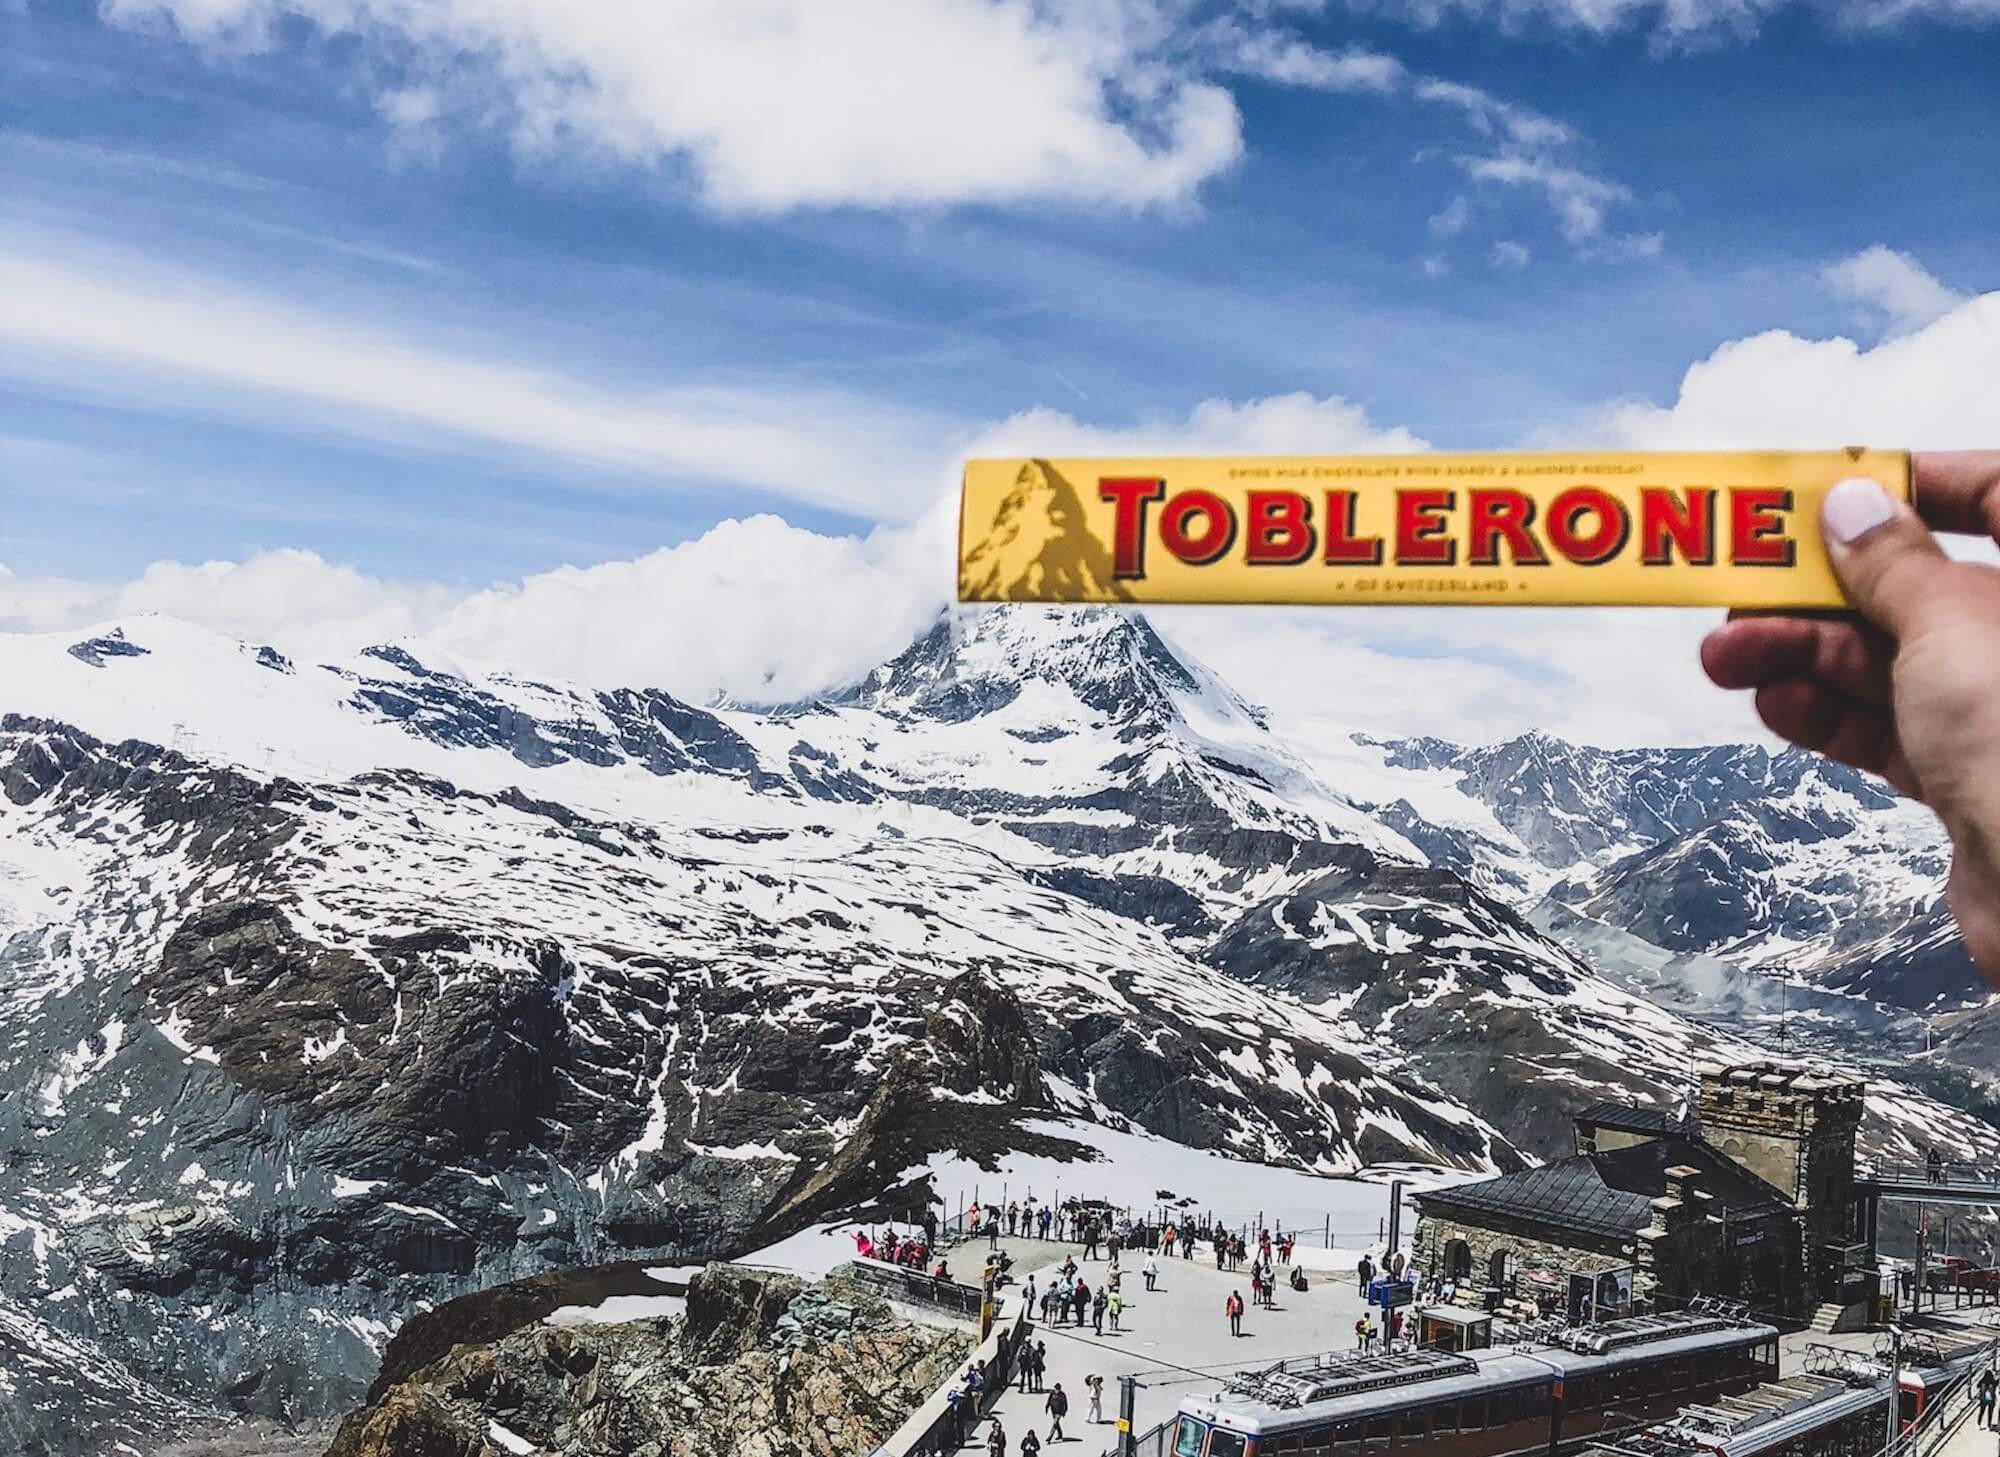 Emballage du chocolat Toblerone devant une montagne